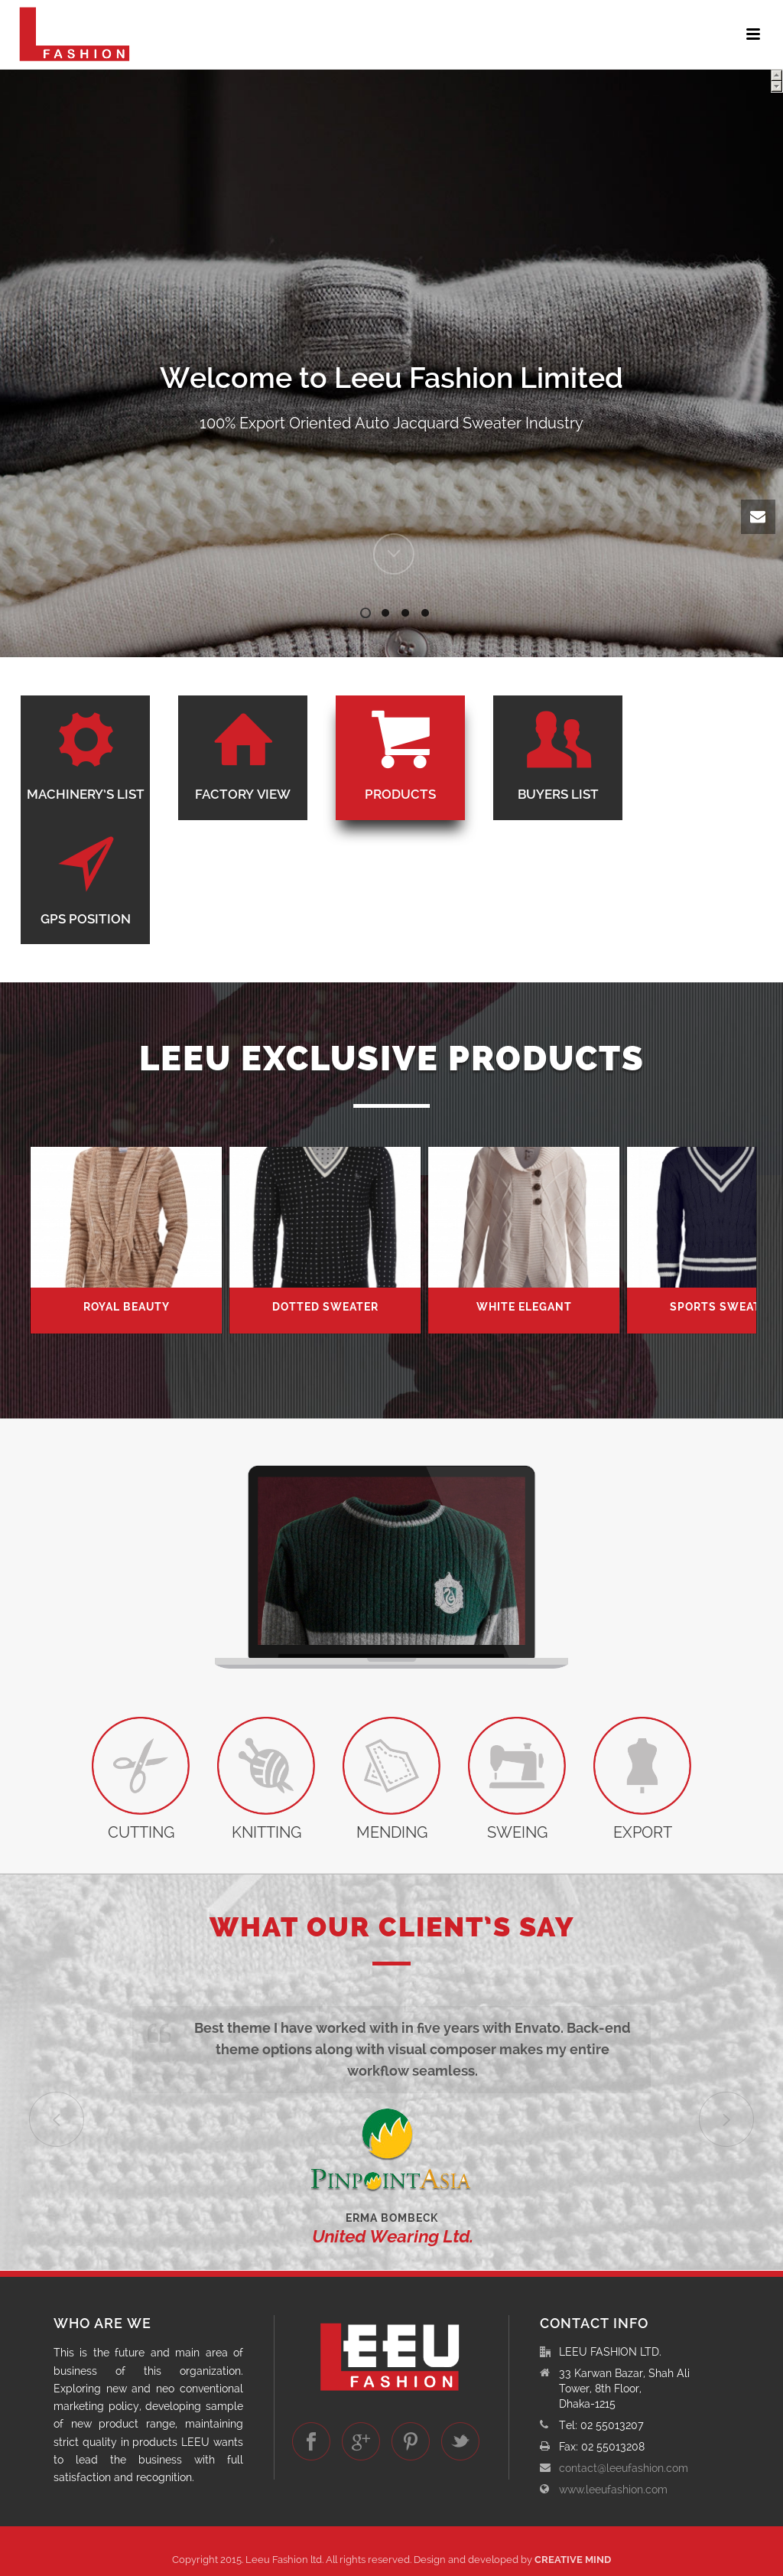 Leeu Fashion Competitors, Revenue and Employees - Owler